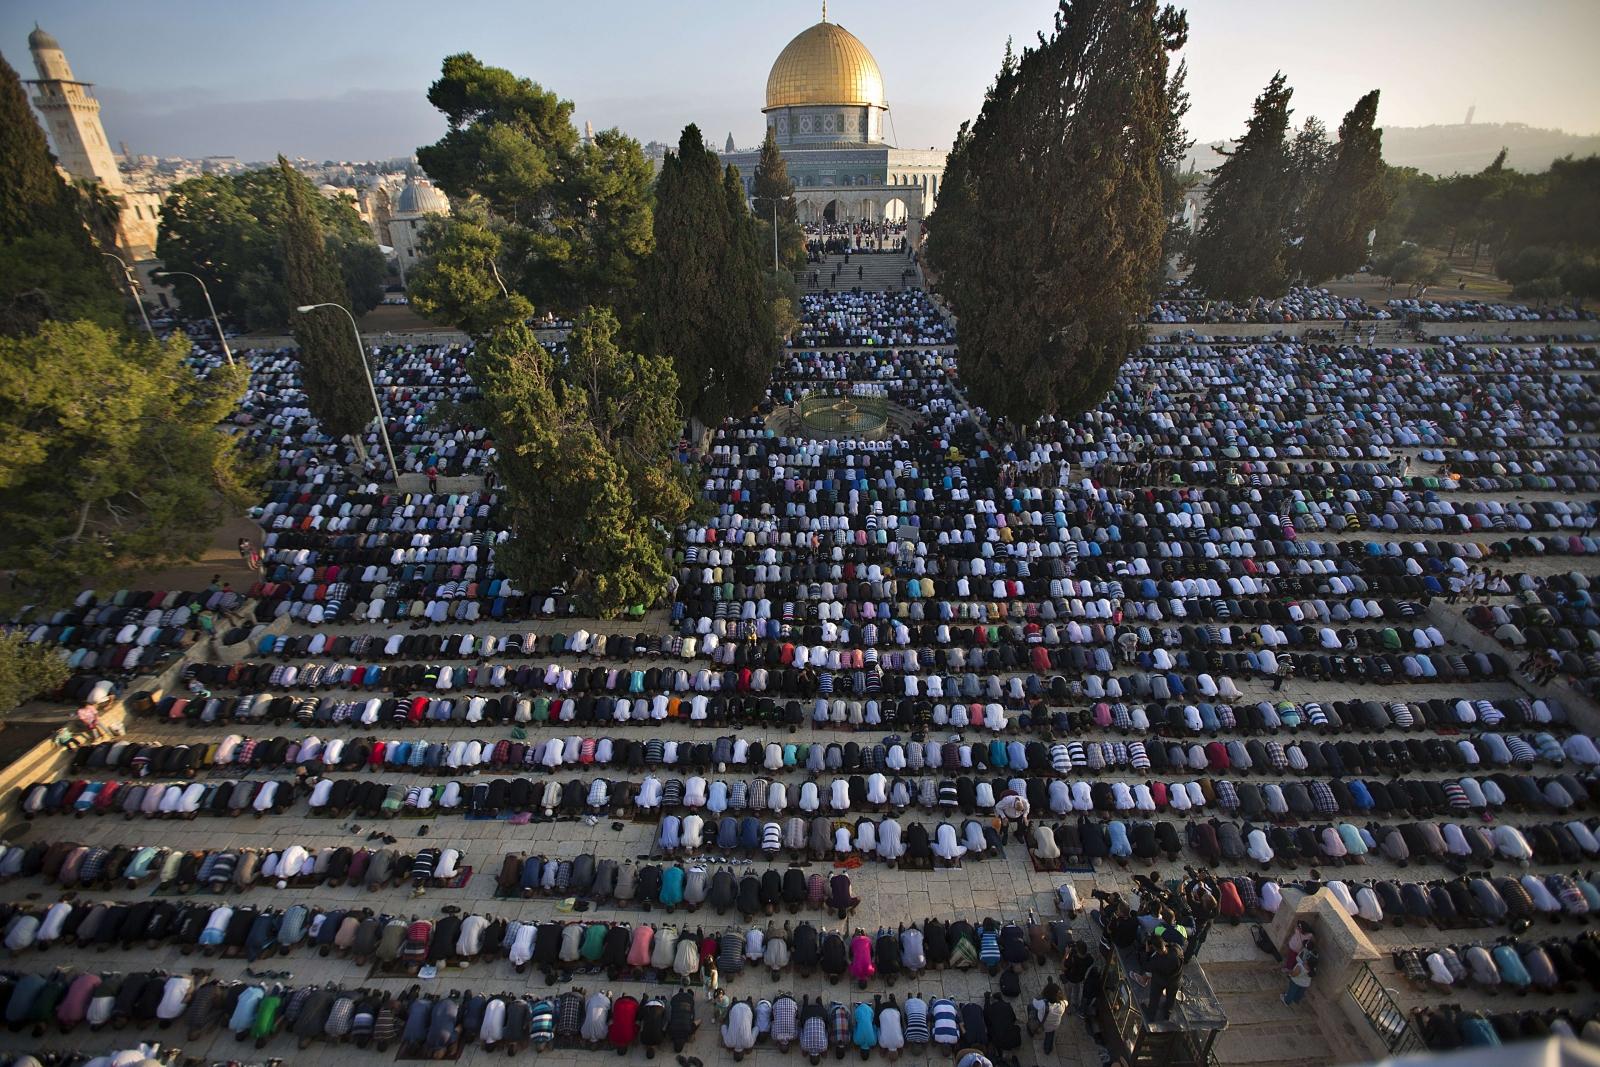 Most Inspiring Bangladesh Eid Al-Fitr Feast - eid-al-fitr-palestine  Collection_479190 .jpg?w\u003d736\u0026e\u003db45c344768be910be16e60784e950b19